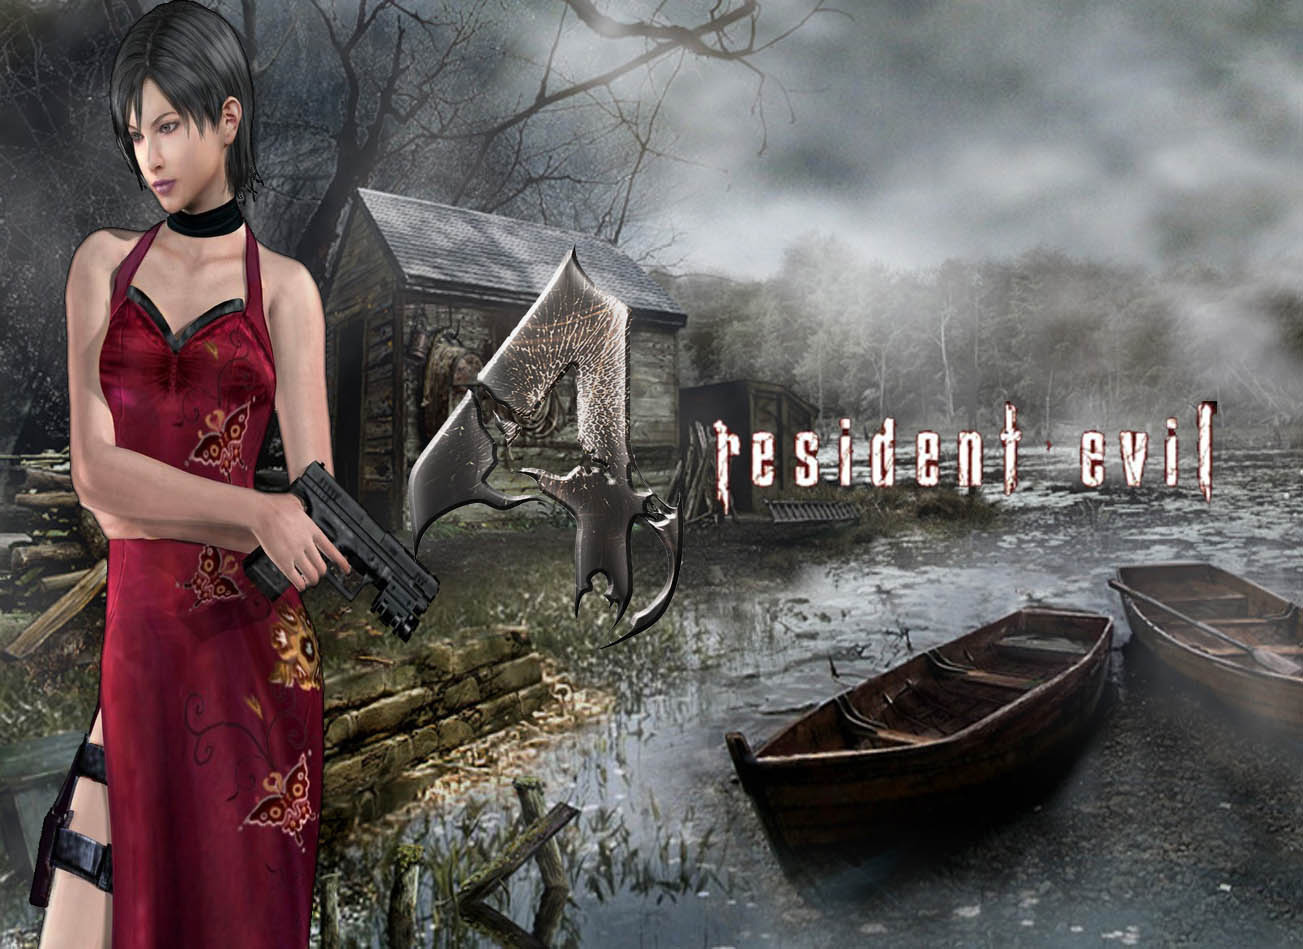 [49+] Resident Evil 7 Wallpapers on WallpaperSafari